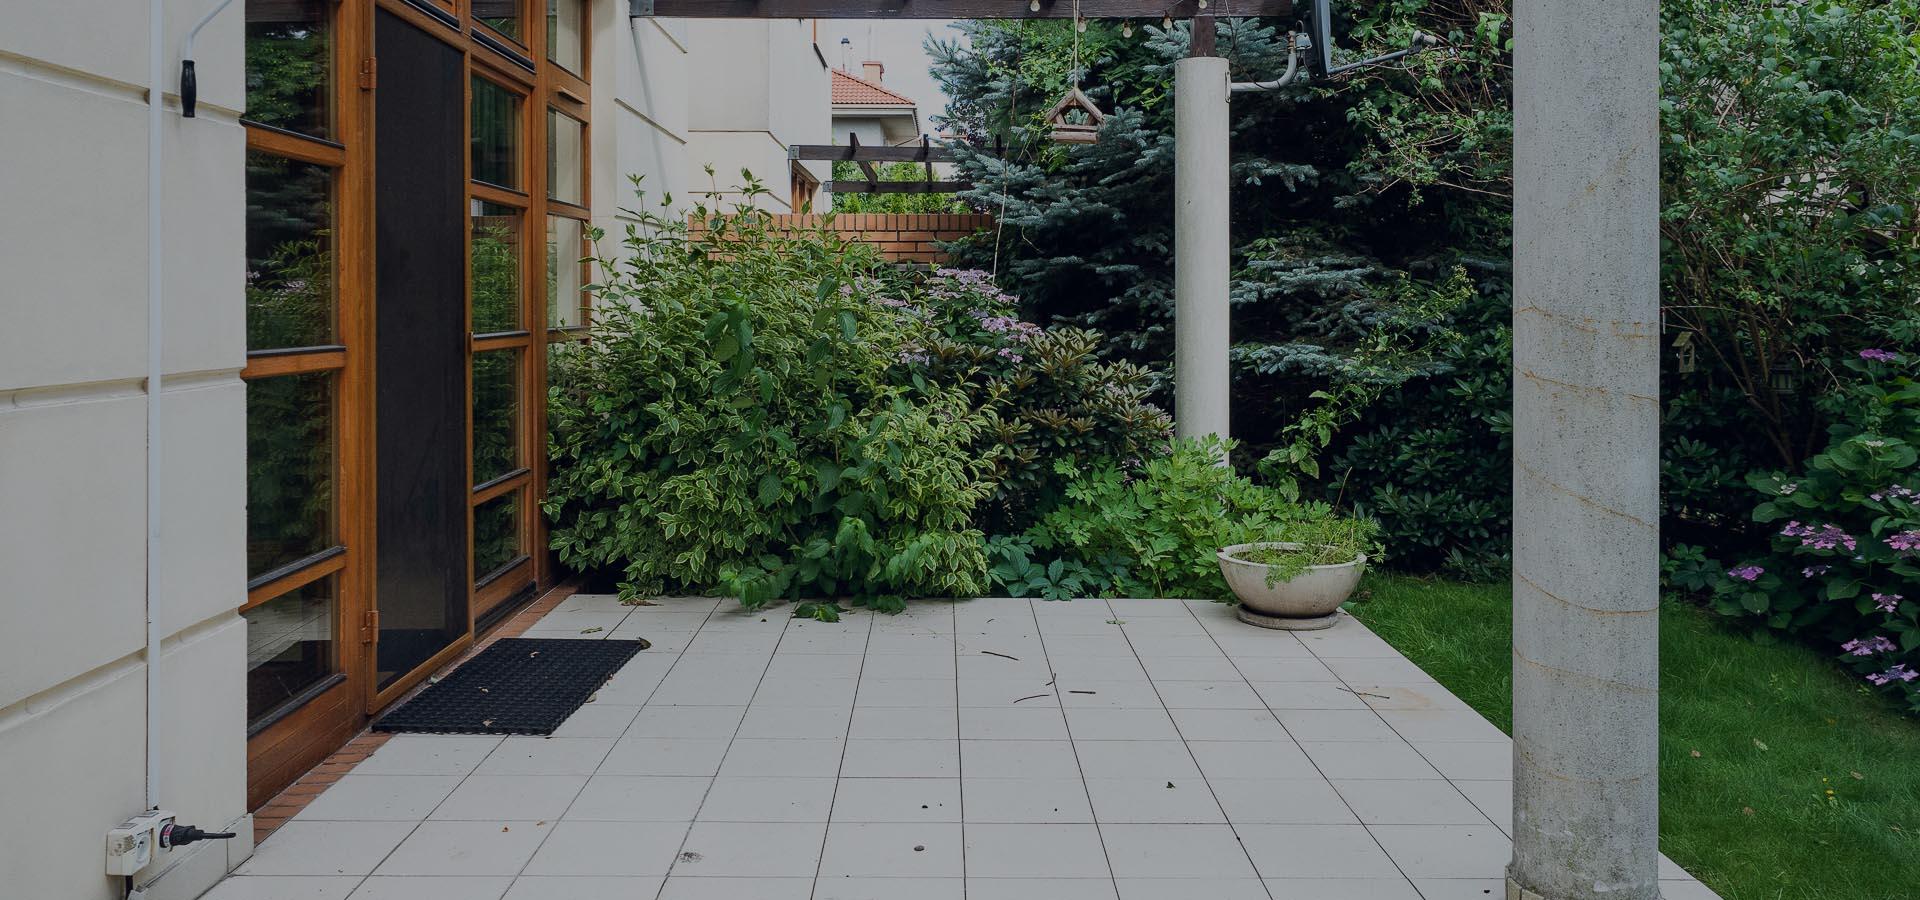 House of Warsaw - Biuro Nieruchomości Faq Slider - 1